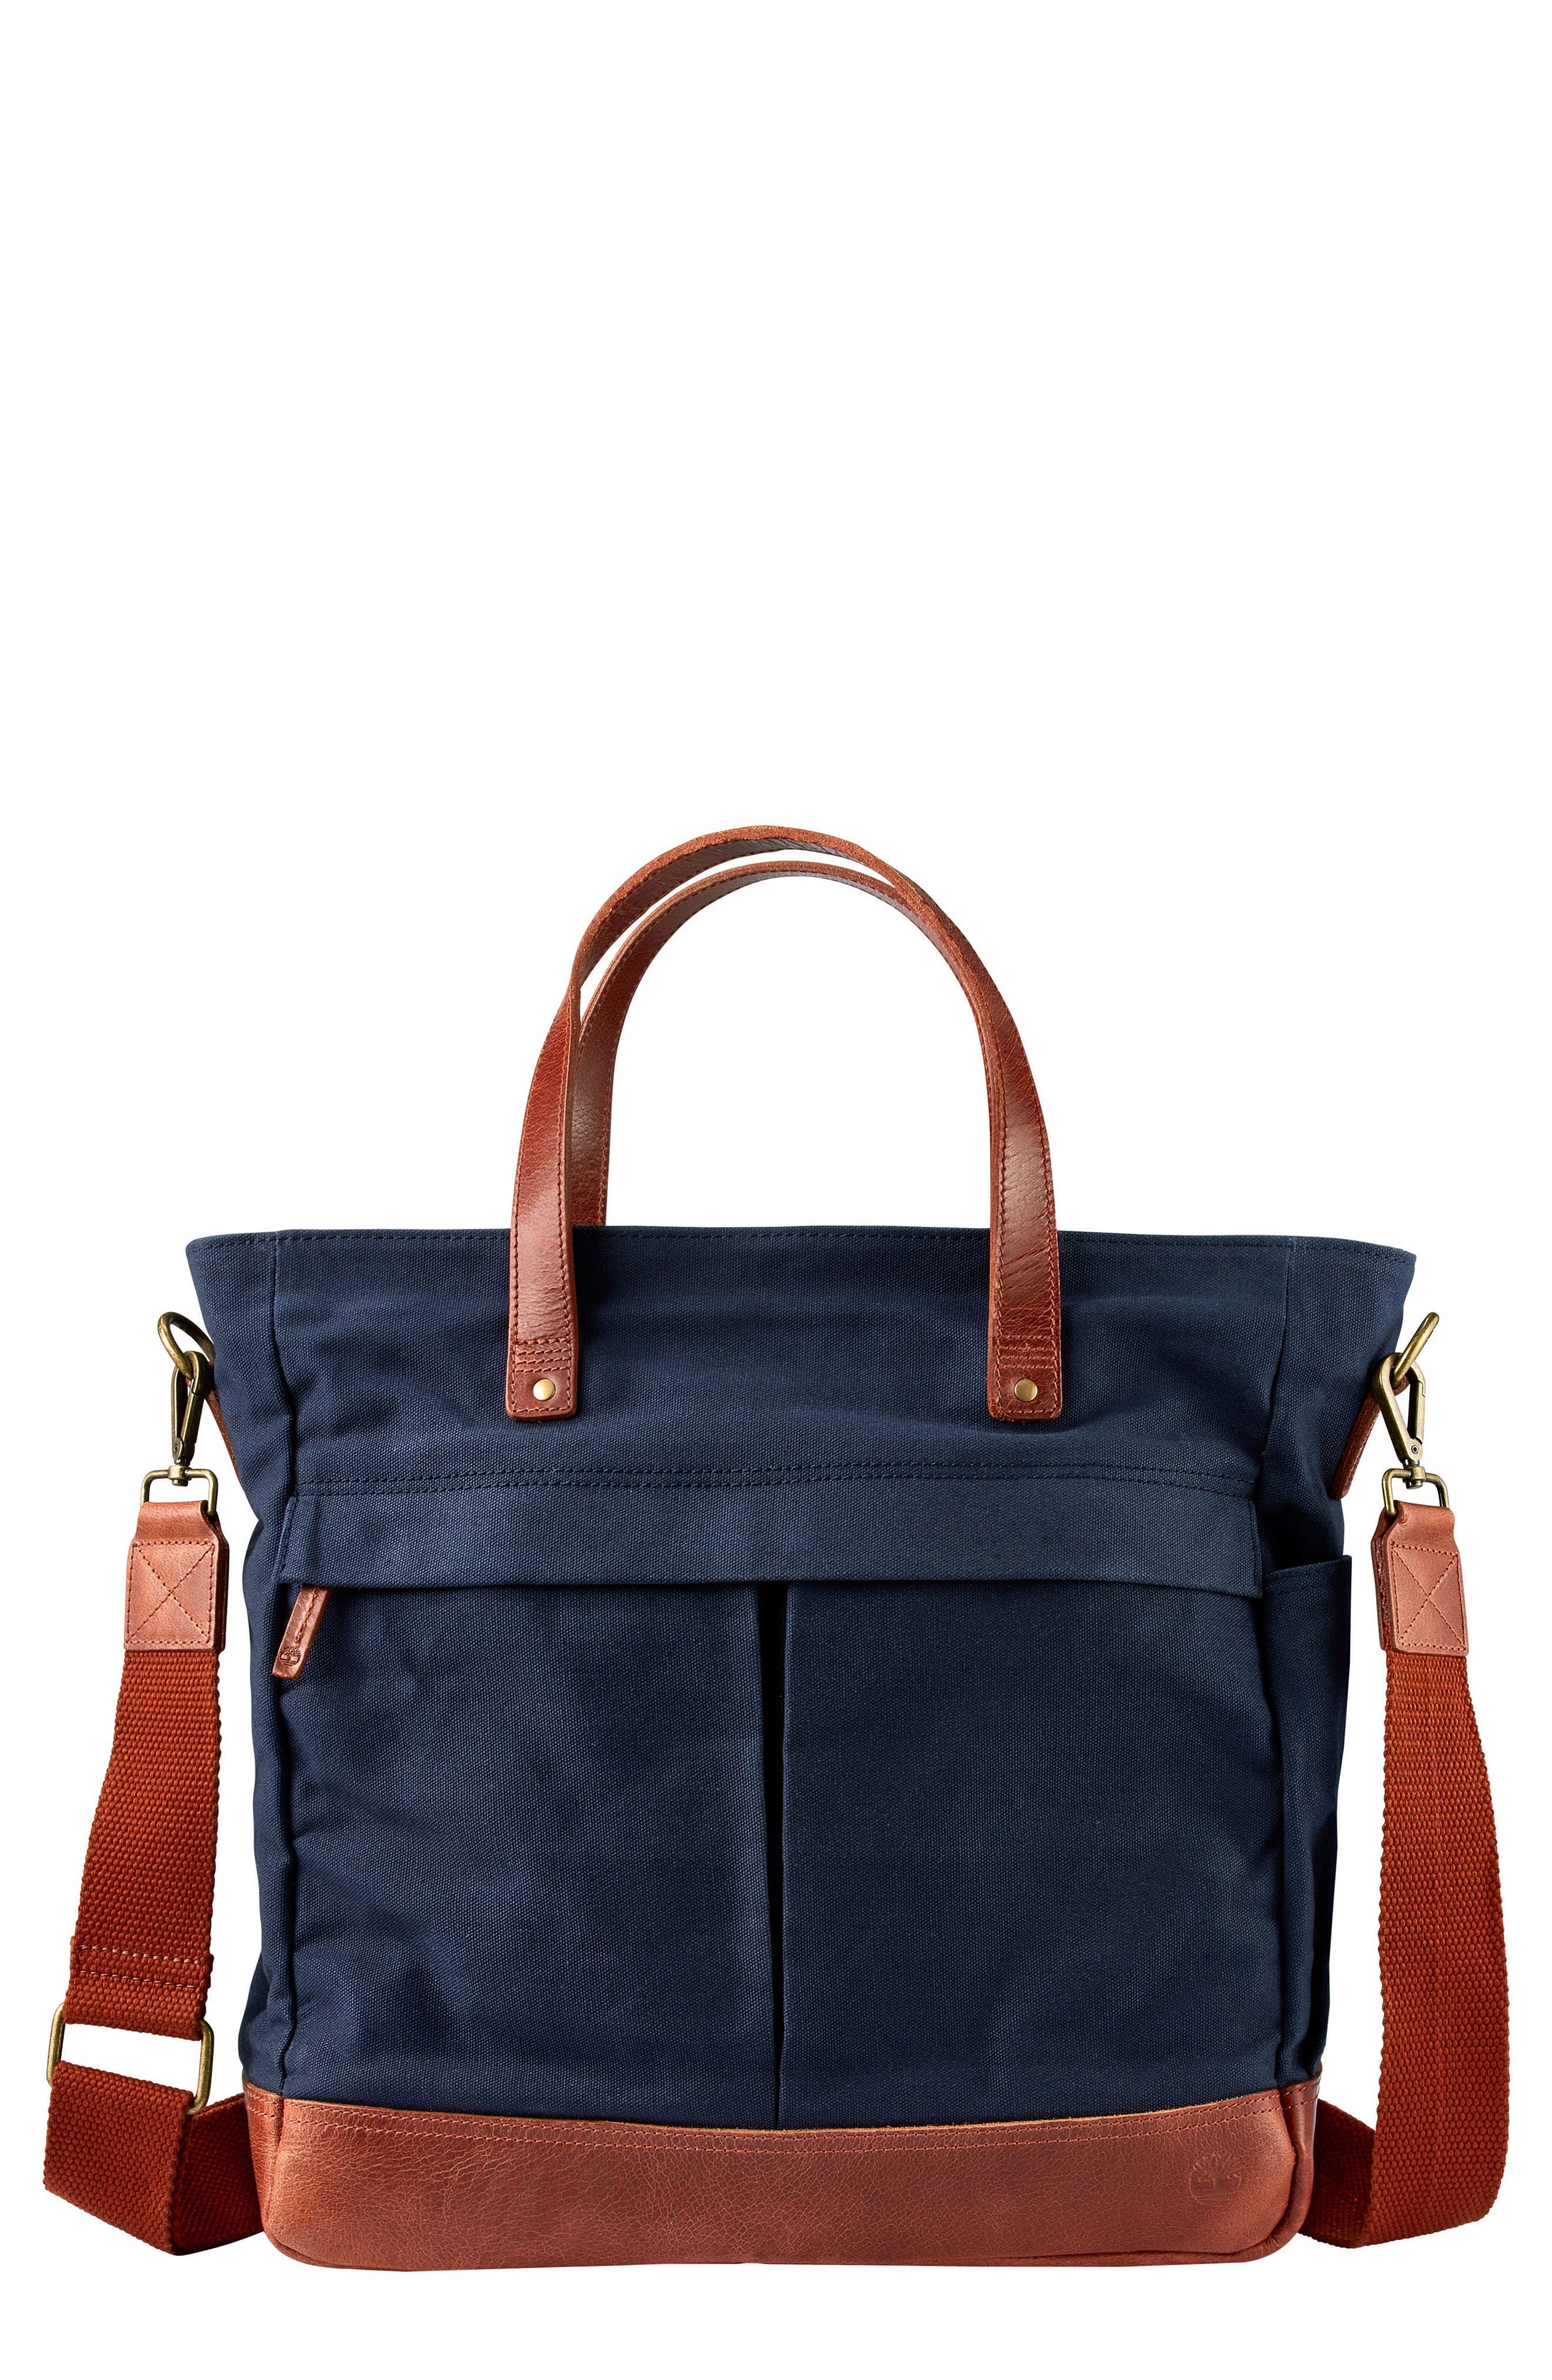 Alternate Image 1 Selected - Timberland Nantasket Tote Bag